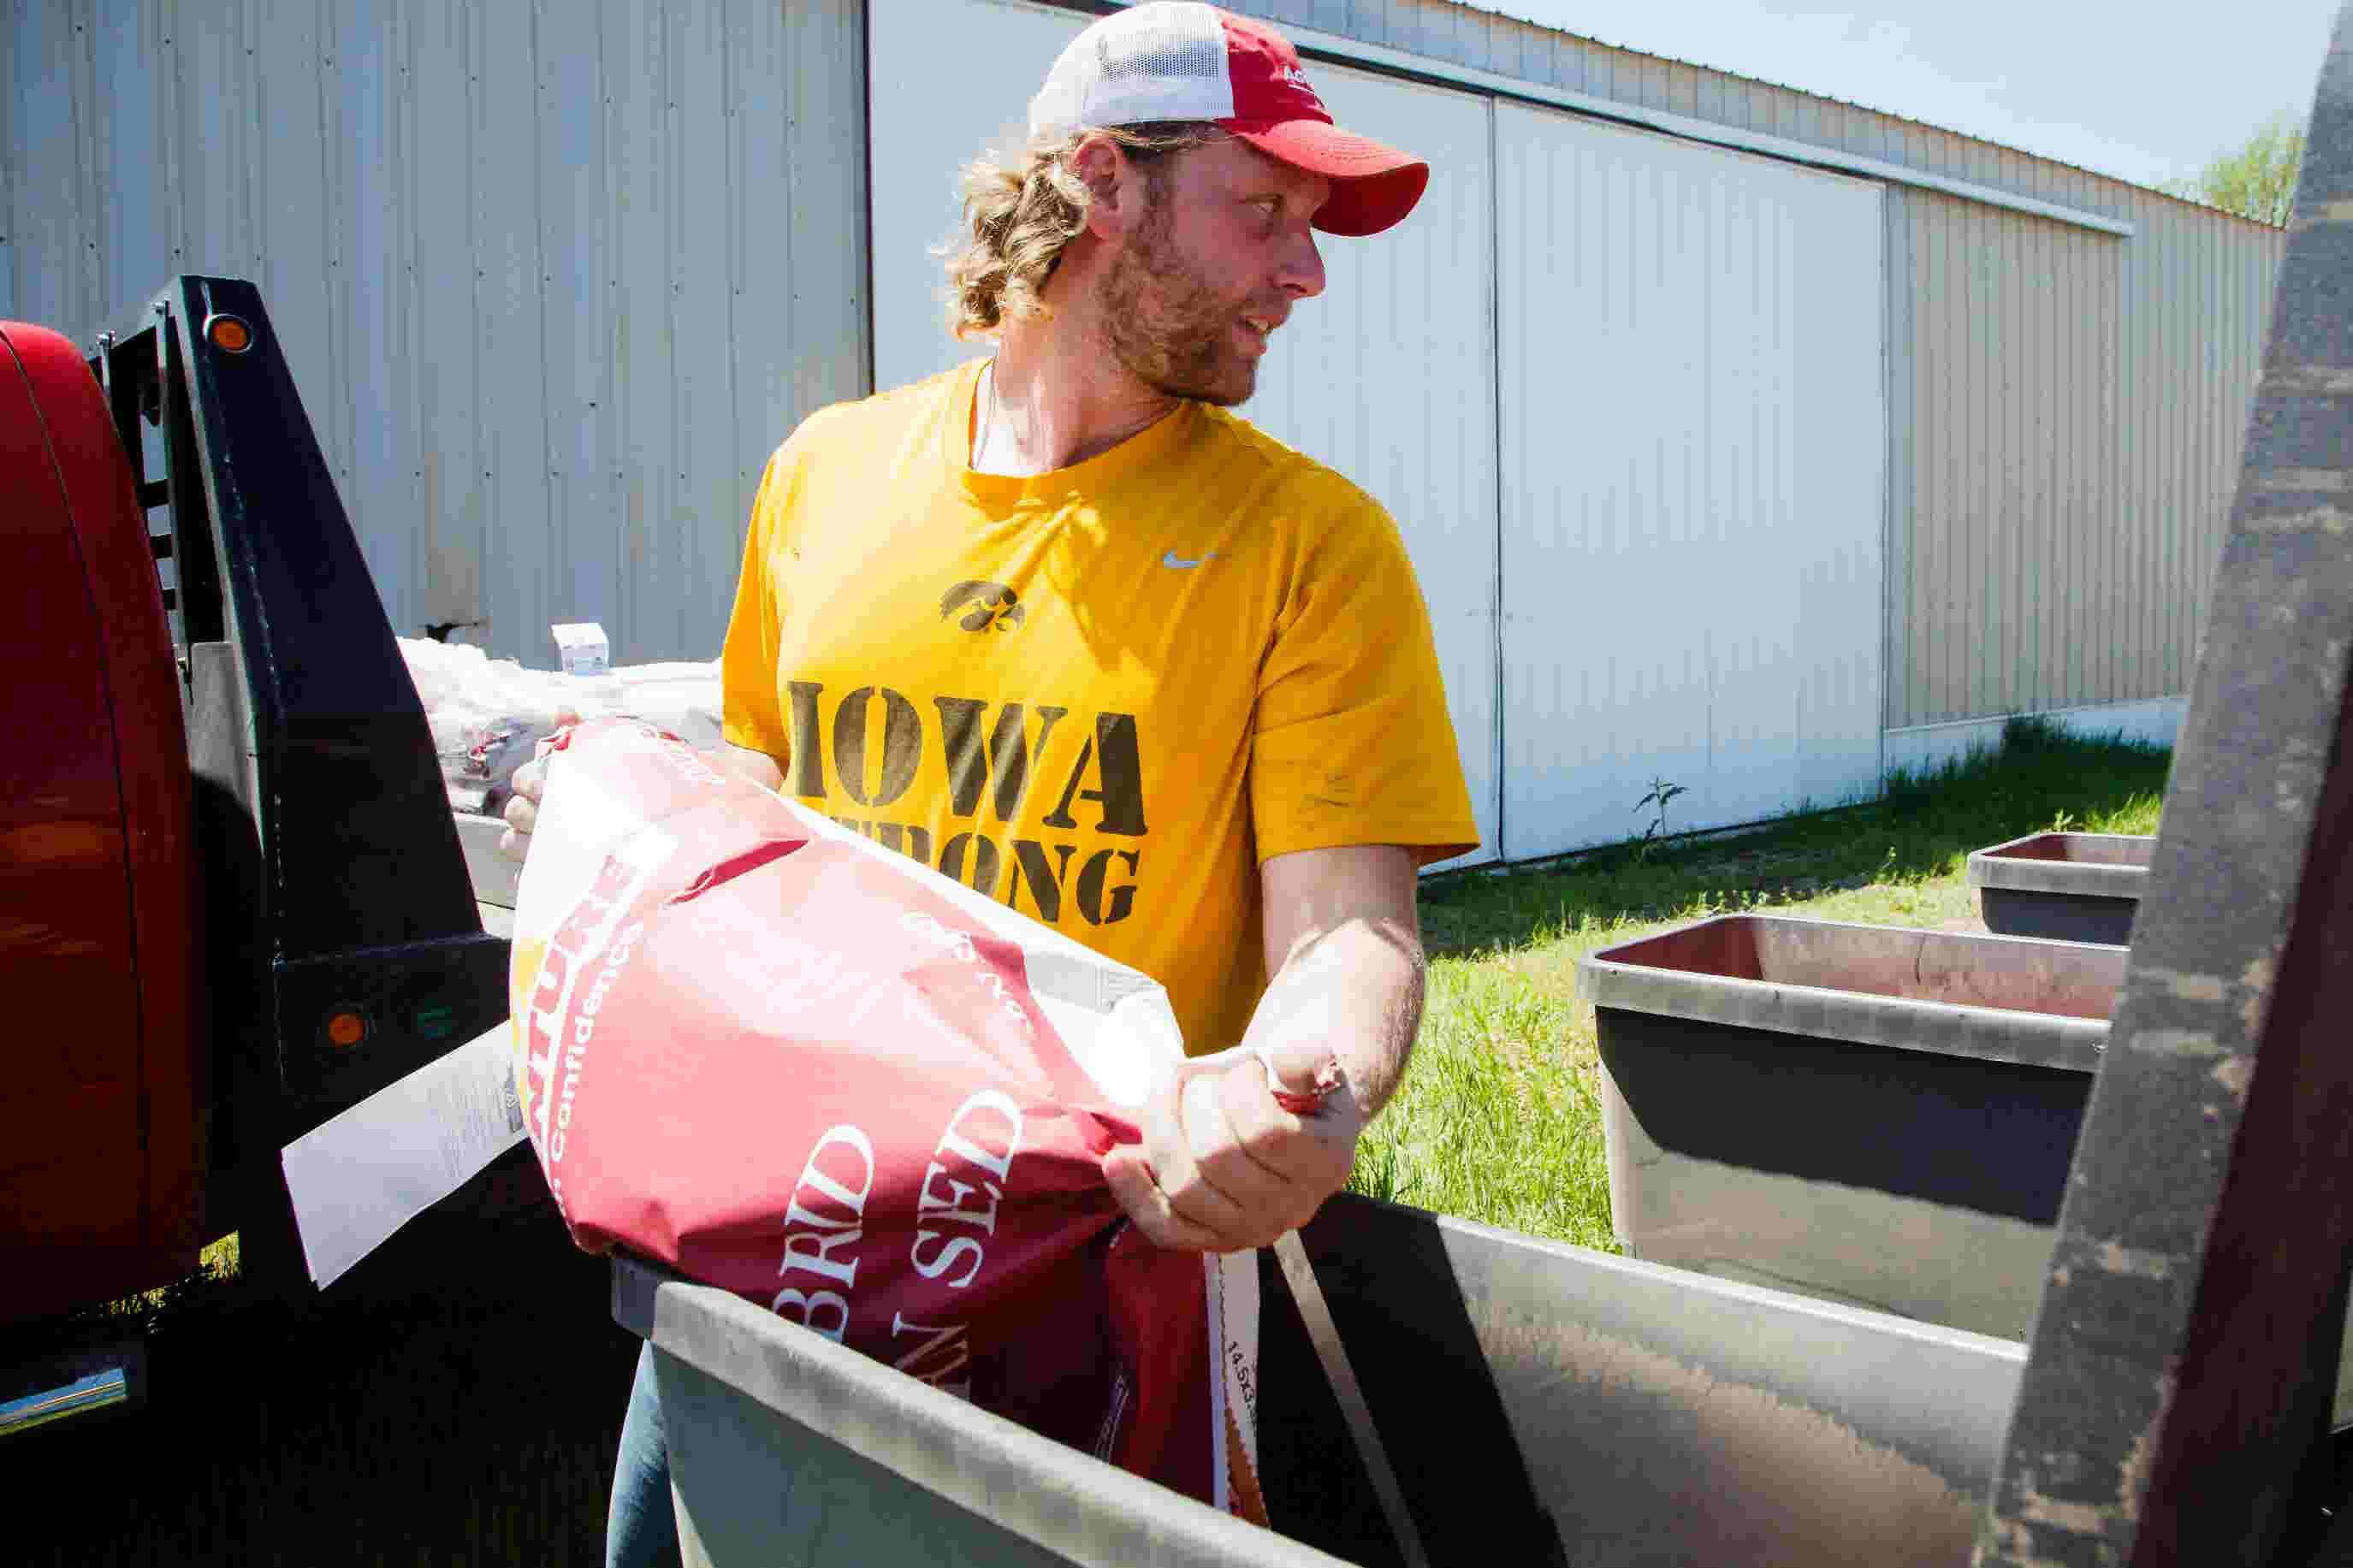 457f904fa NFL dreams died. So ex-Iowa star Drew Ott builds life as a farmer